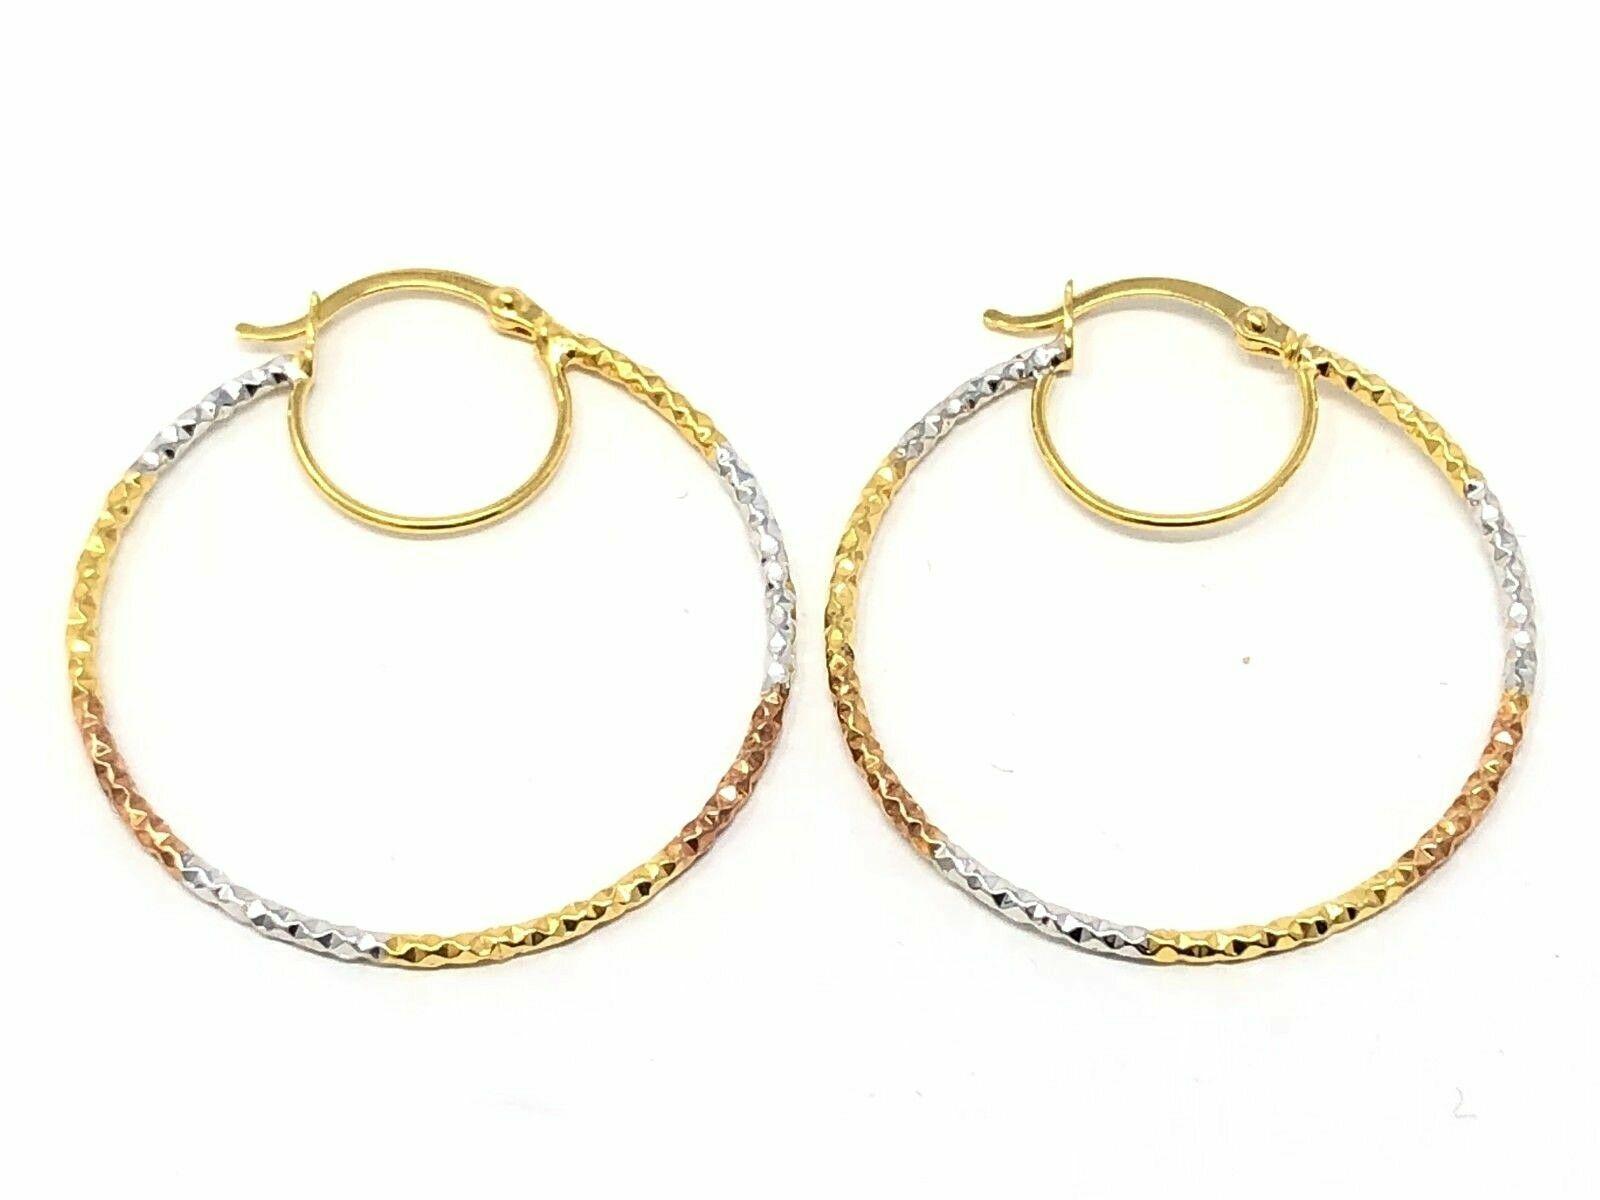 "Italy 14K Yellow Gold Hollow Diamond Cut Round Hoop Loop Earrings 1/"" 3.1mm 2g"